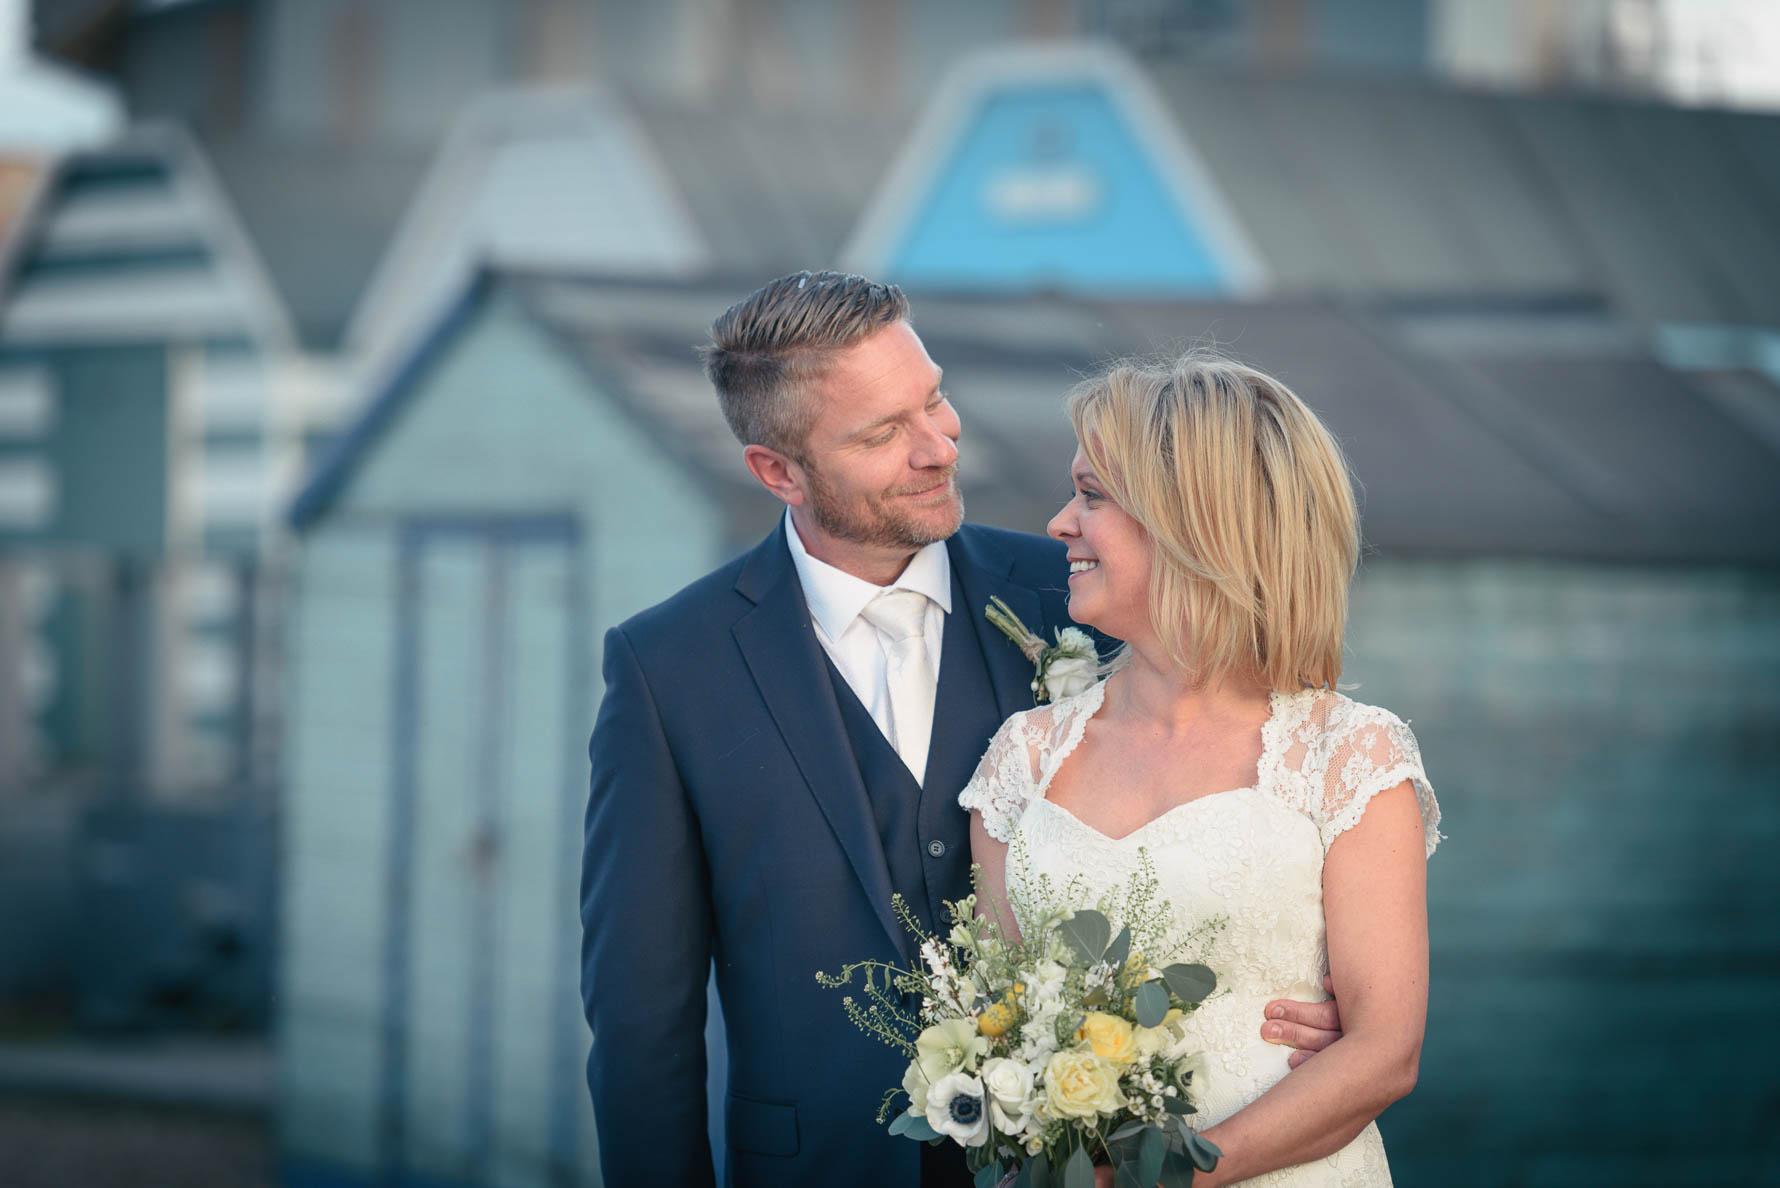 Wedding Photographer East Quay Venue-26.jpg